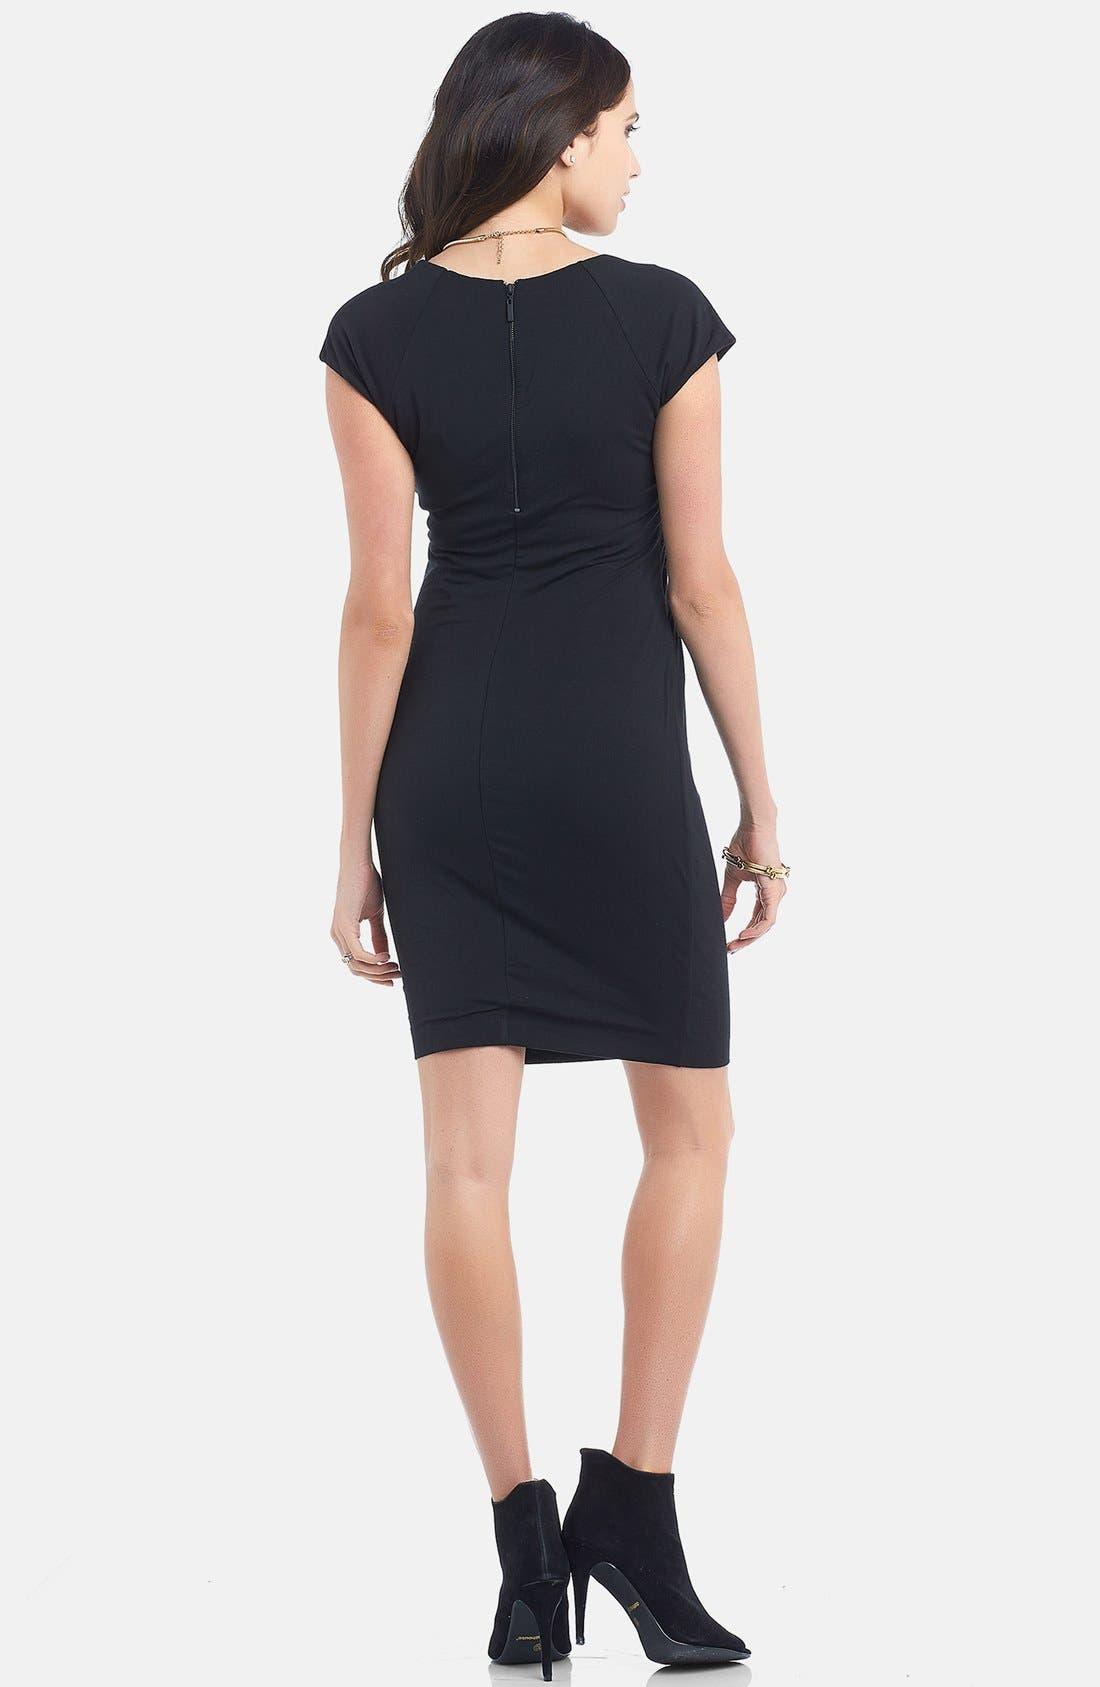 TART MATERNITY,                             'Freya' Print Body-Con Maternity Dress,                             Alternate thumbnail 2, color,                             BLACK